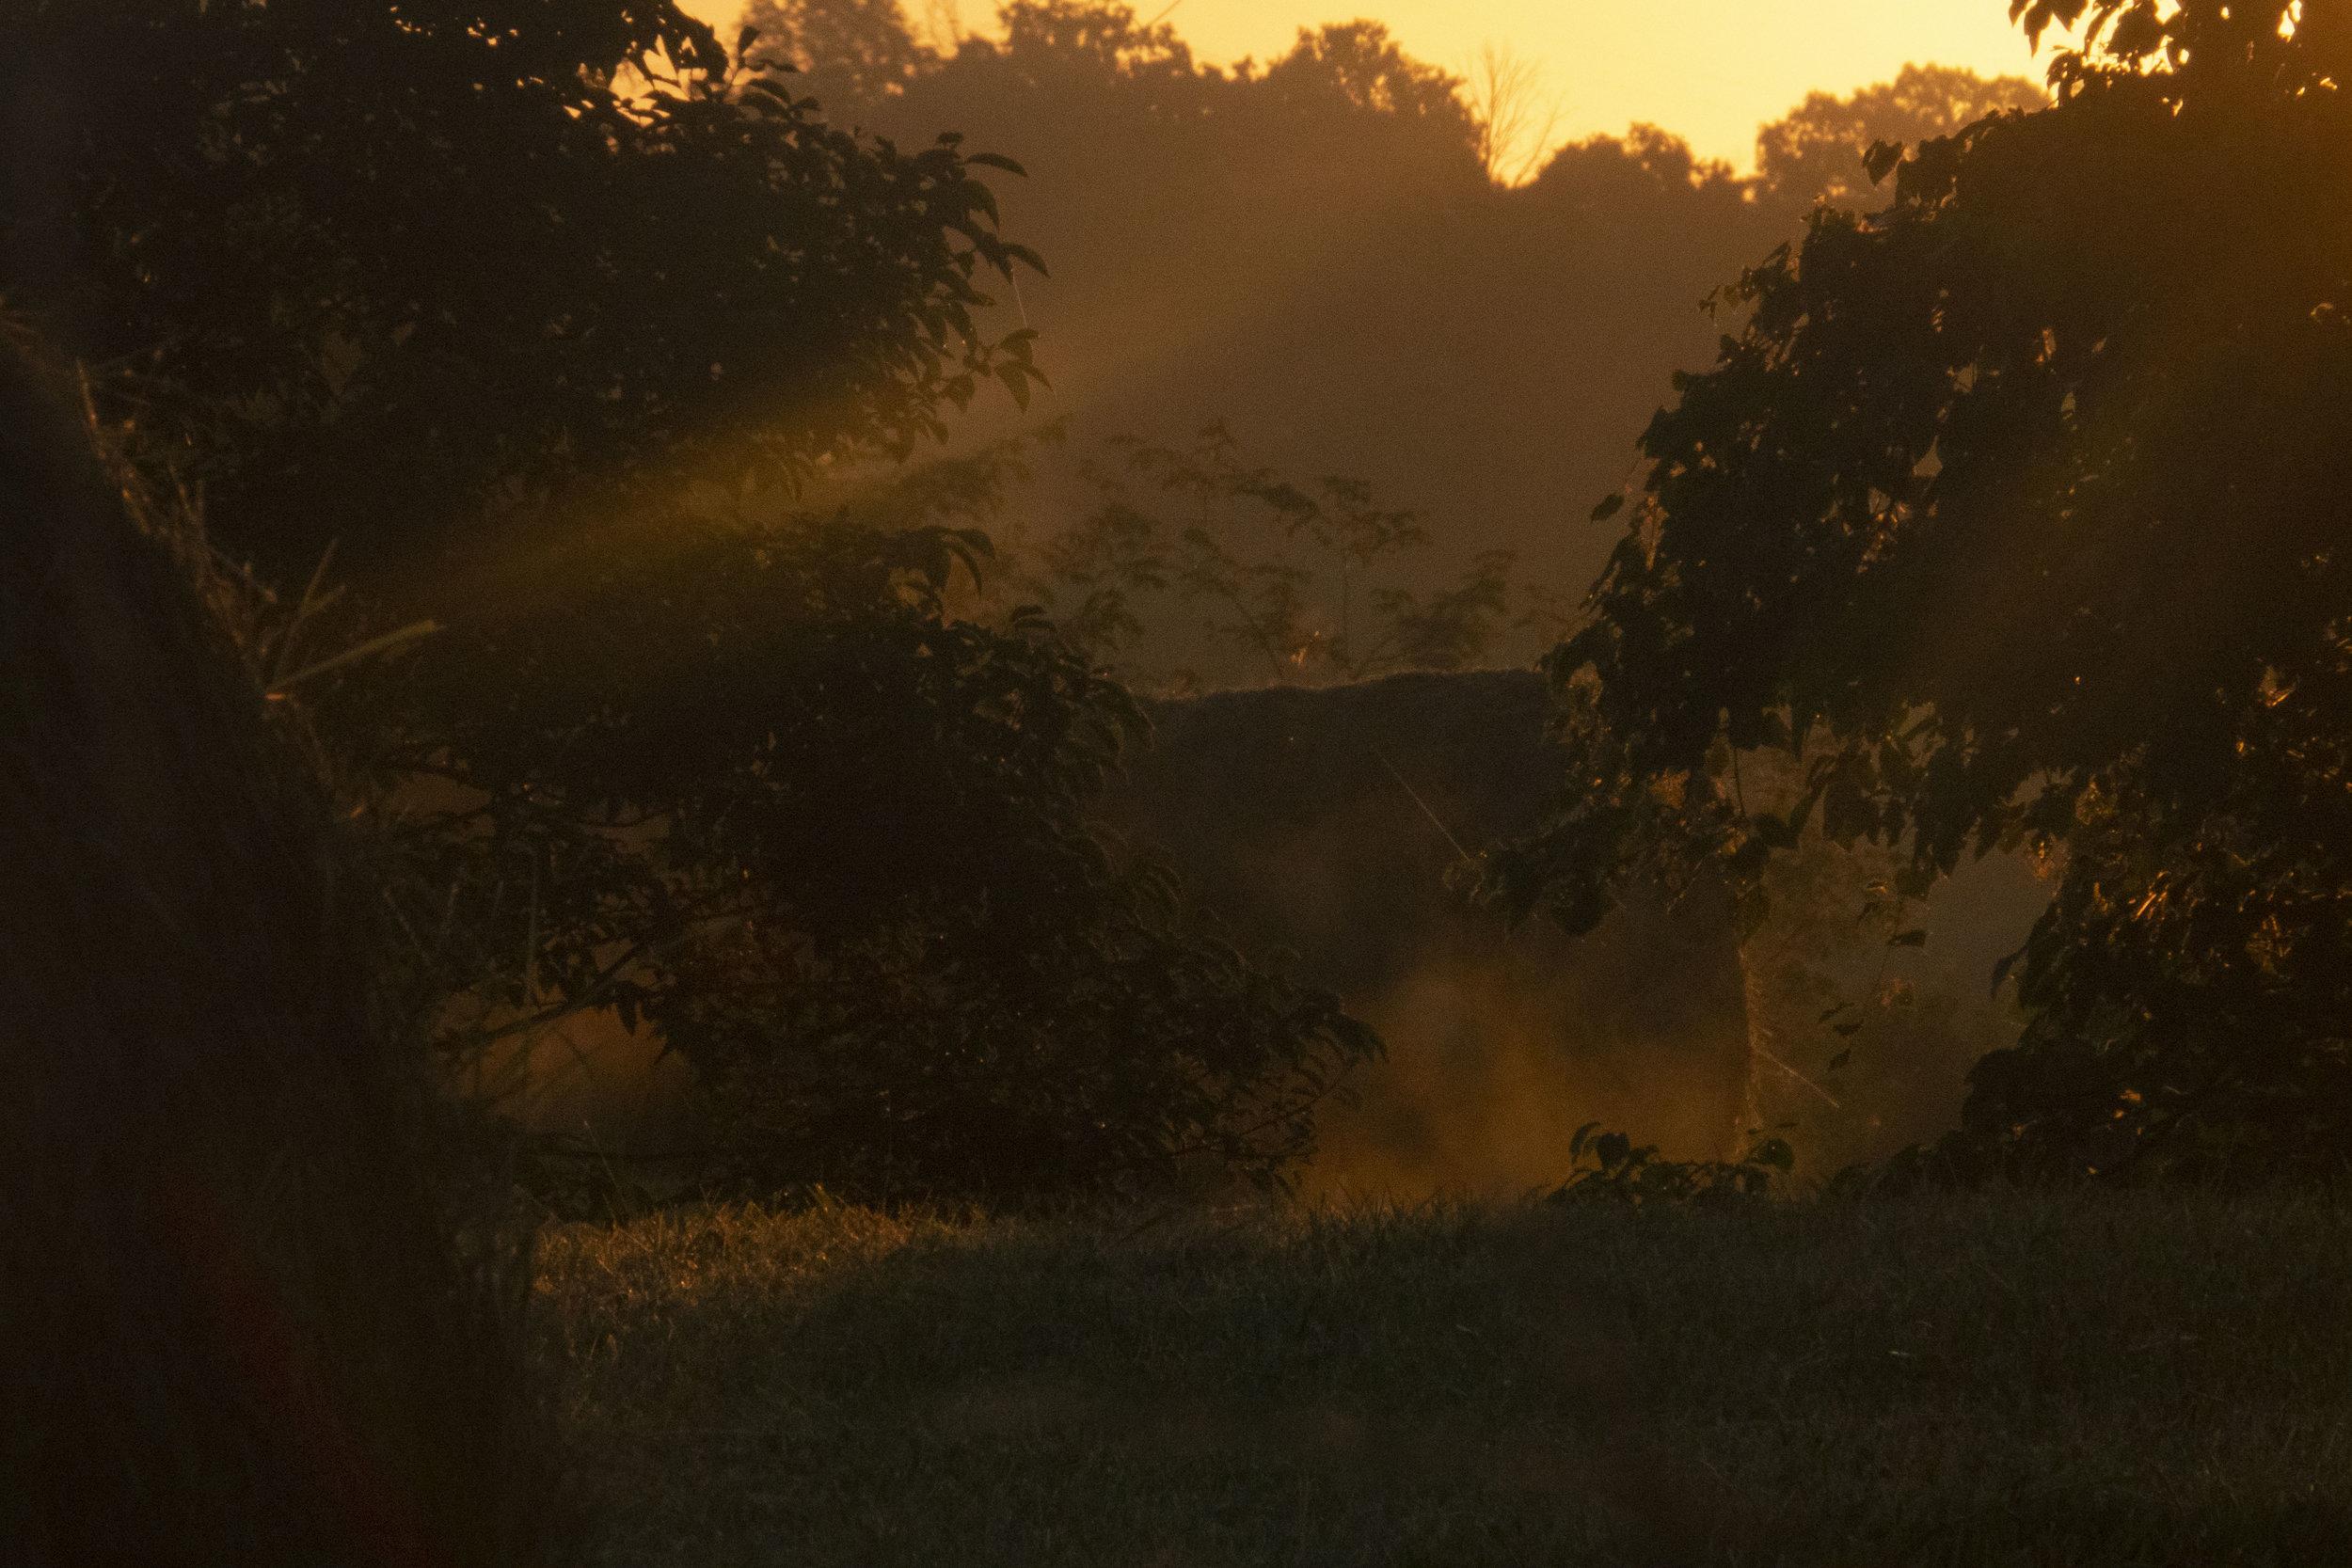 - Dawn to Dusk1.jpg